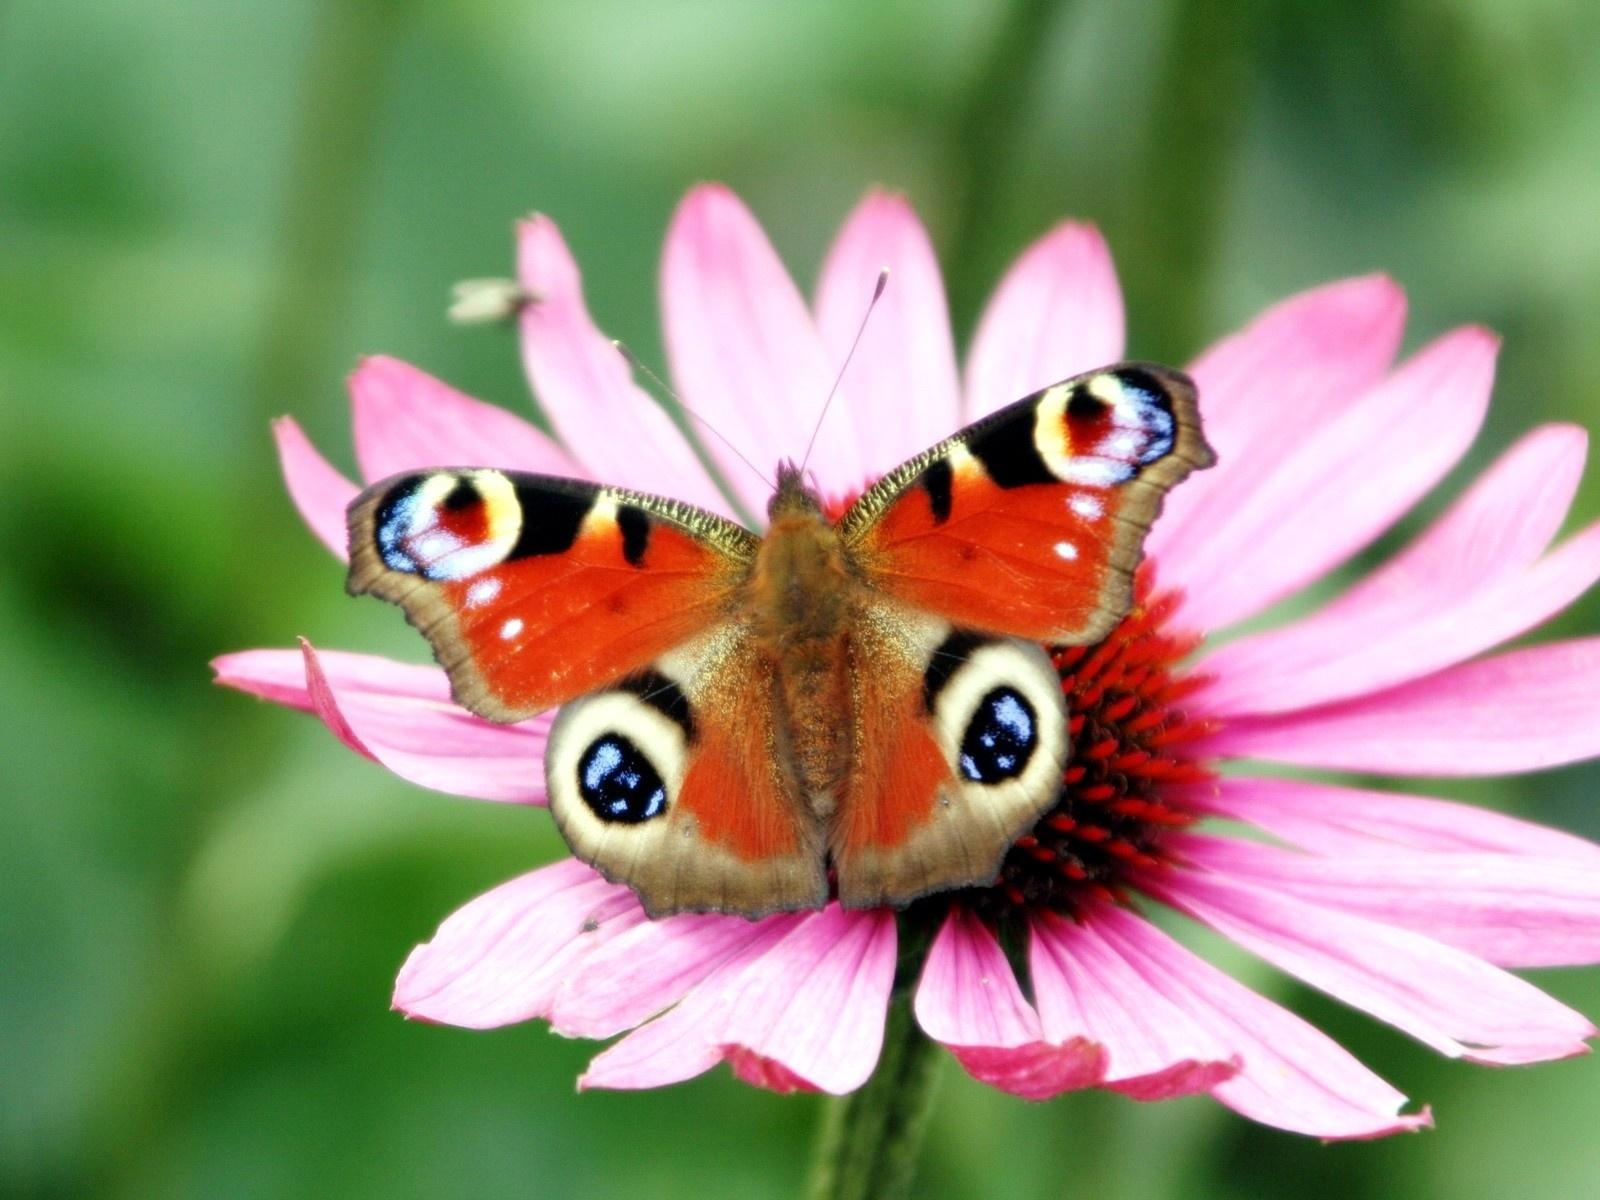 Pea Erfly Flower